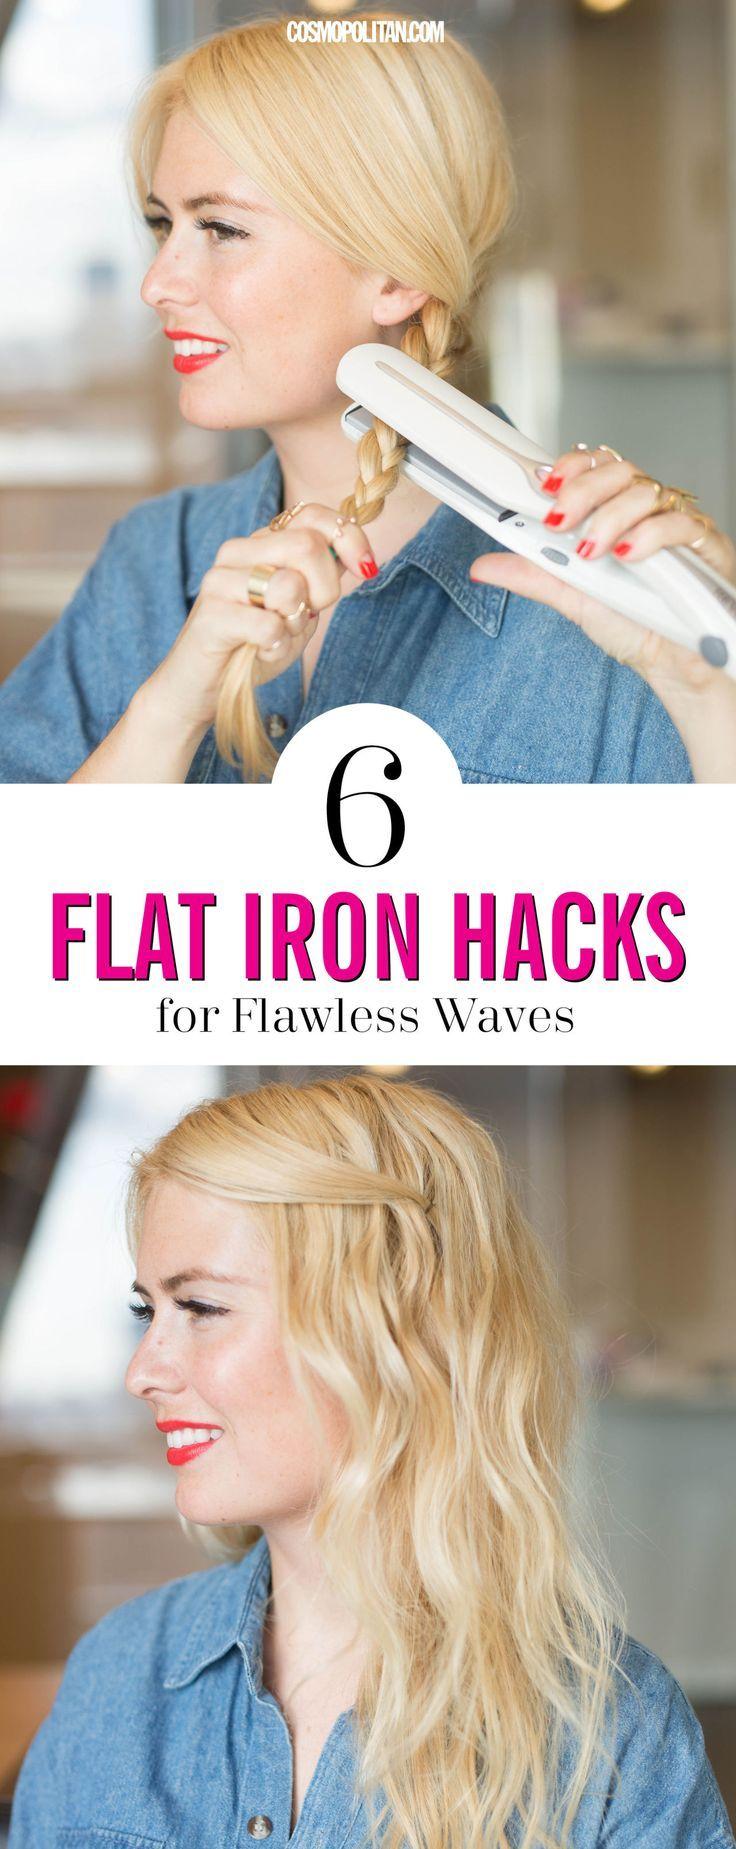 7 Hacks That Make FlatIron Waves *So* Much Easier